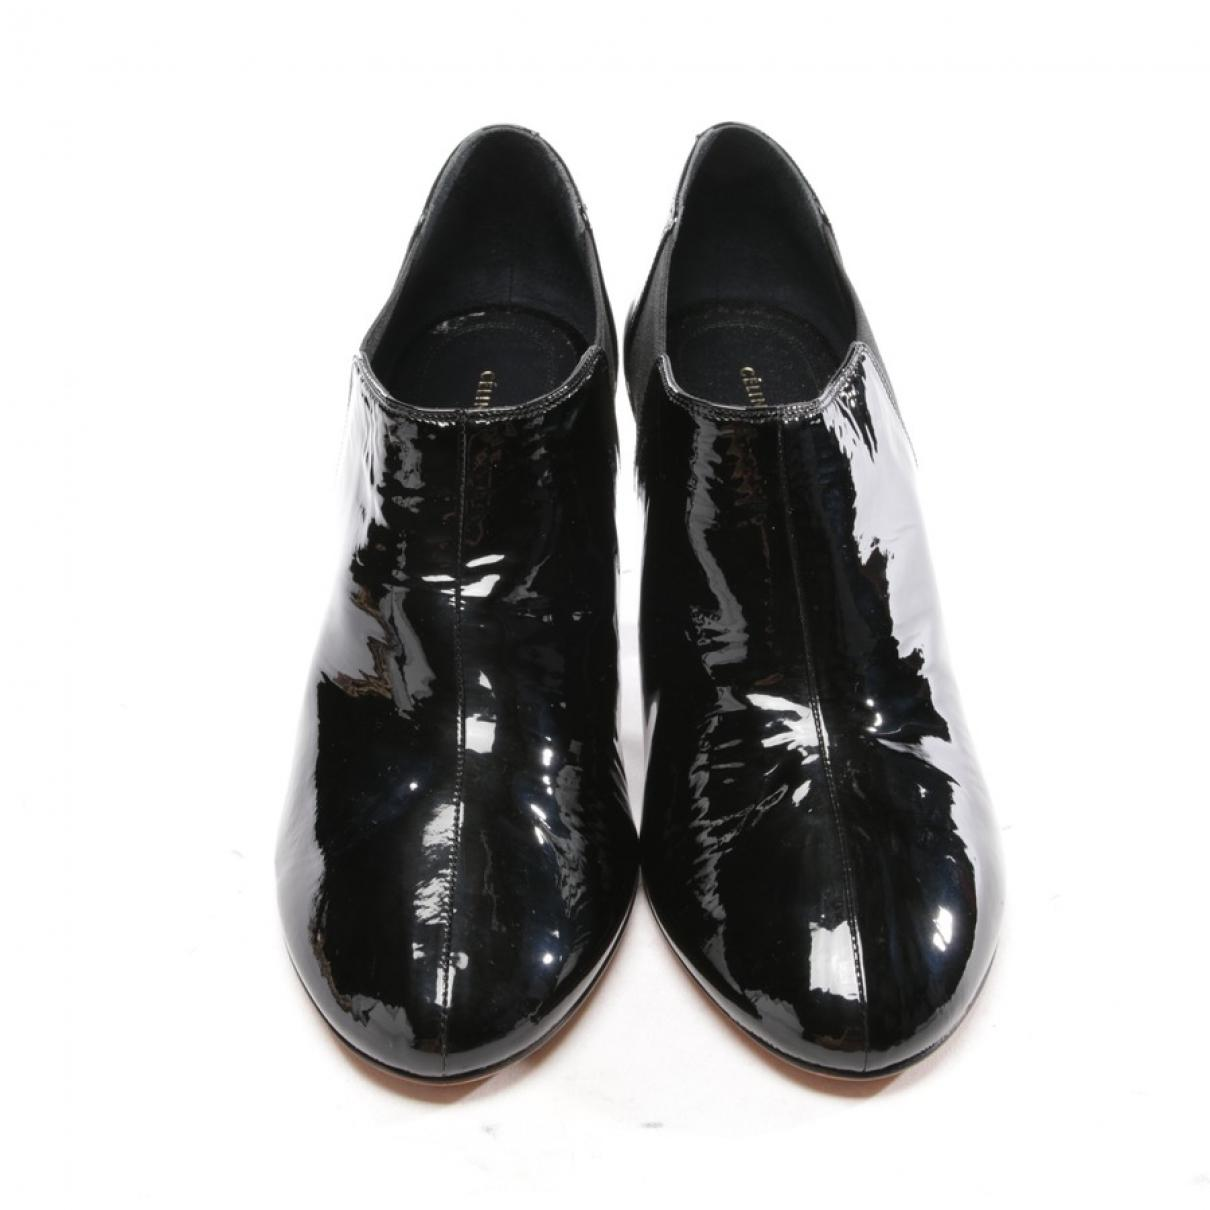 Botines de Charol Celine de color Negro